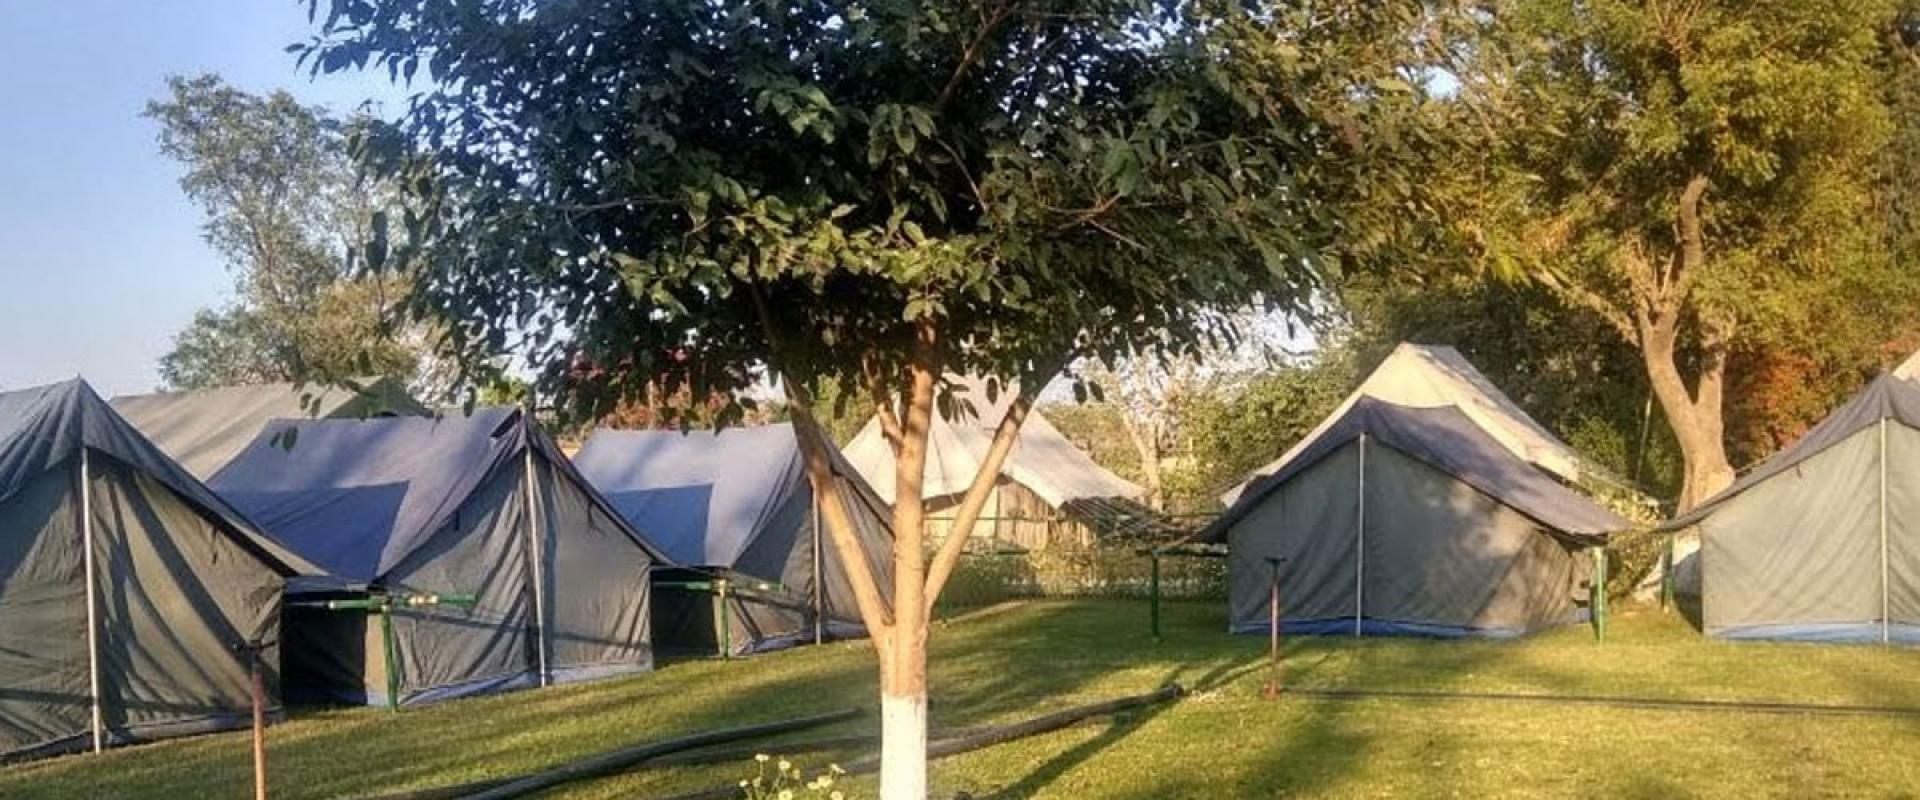 camp-morning